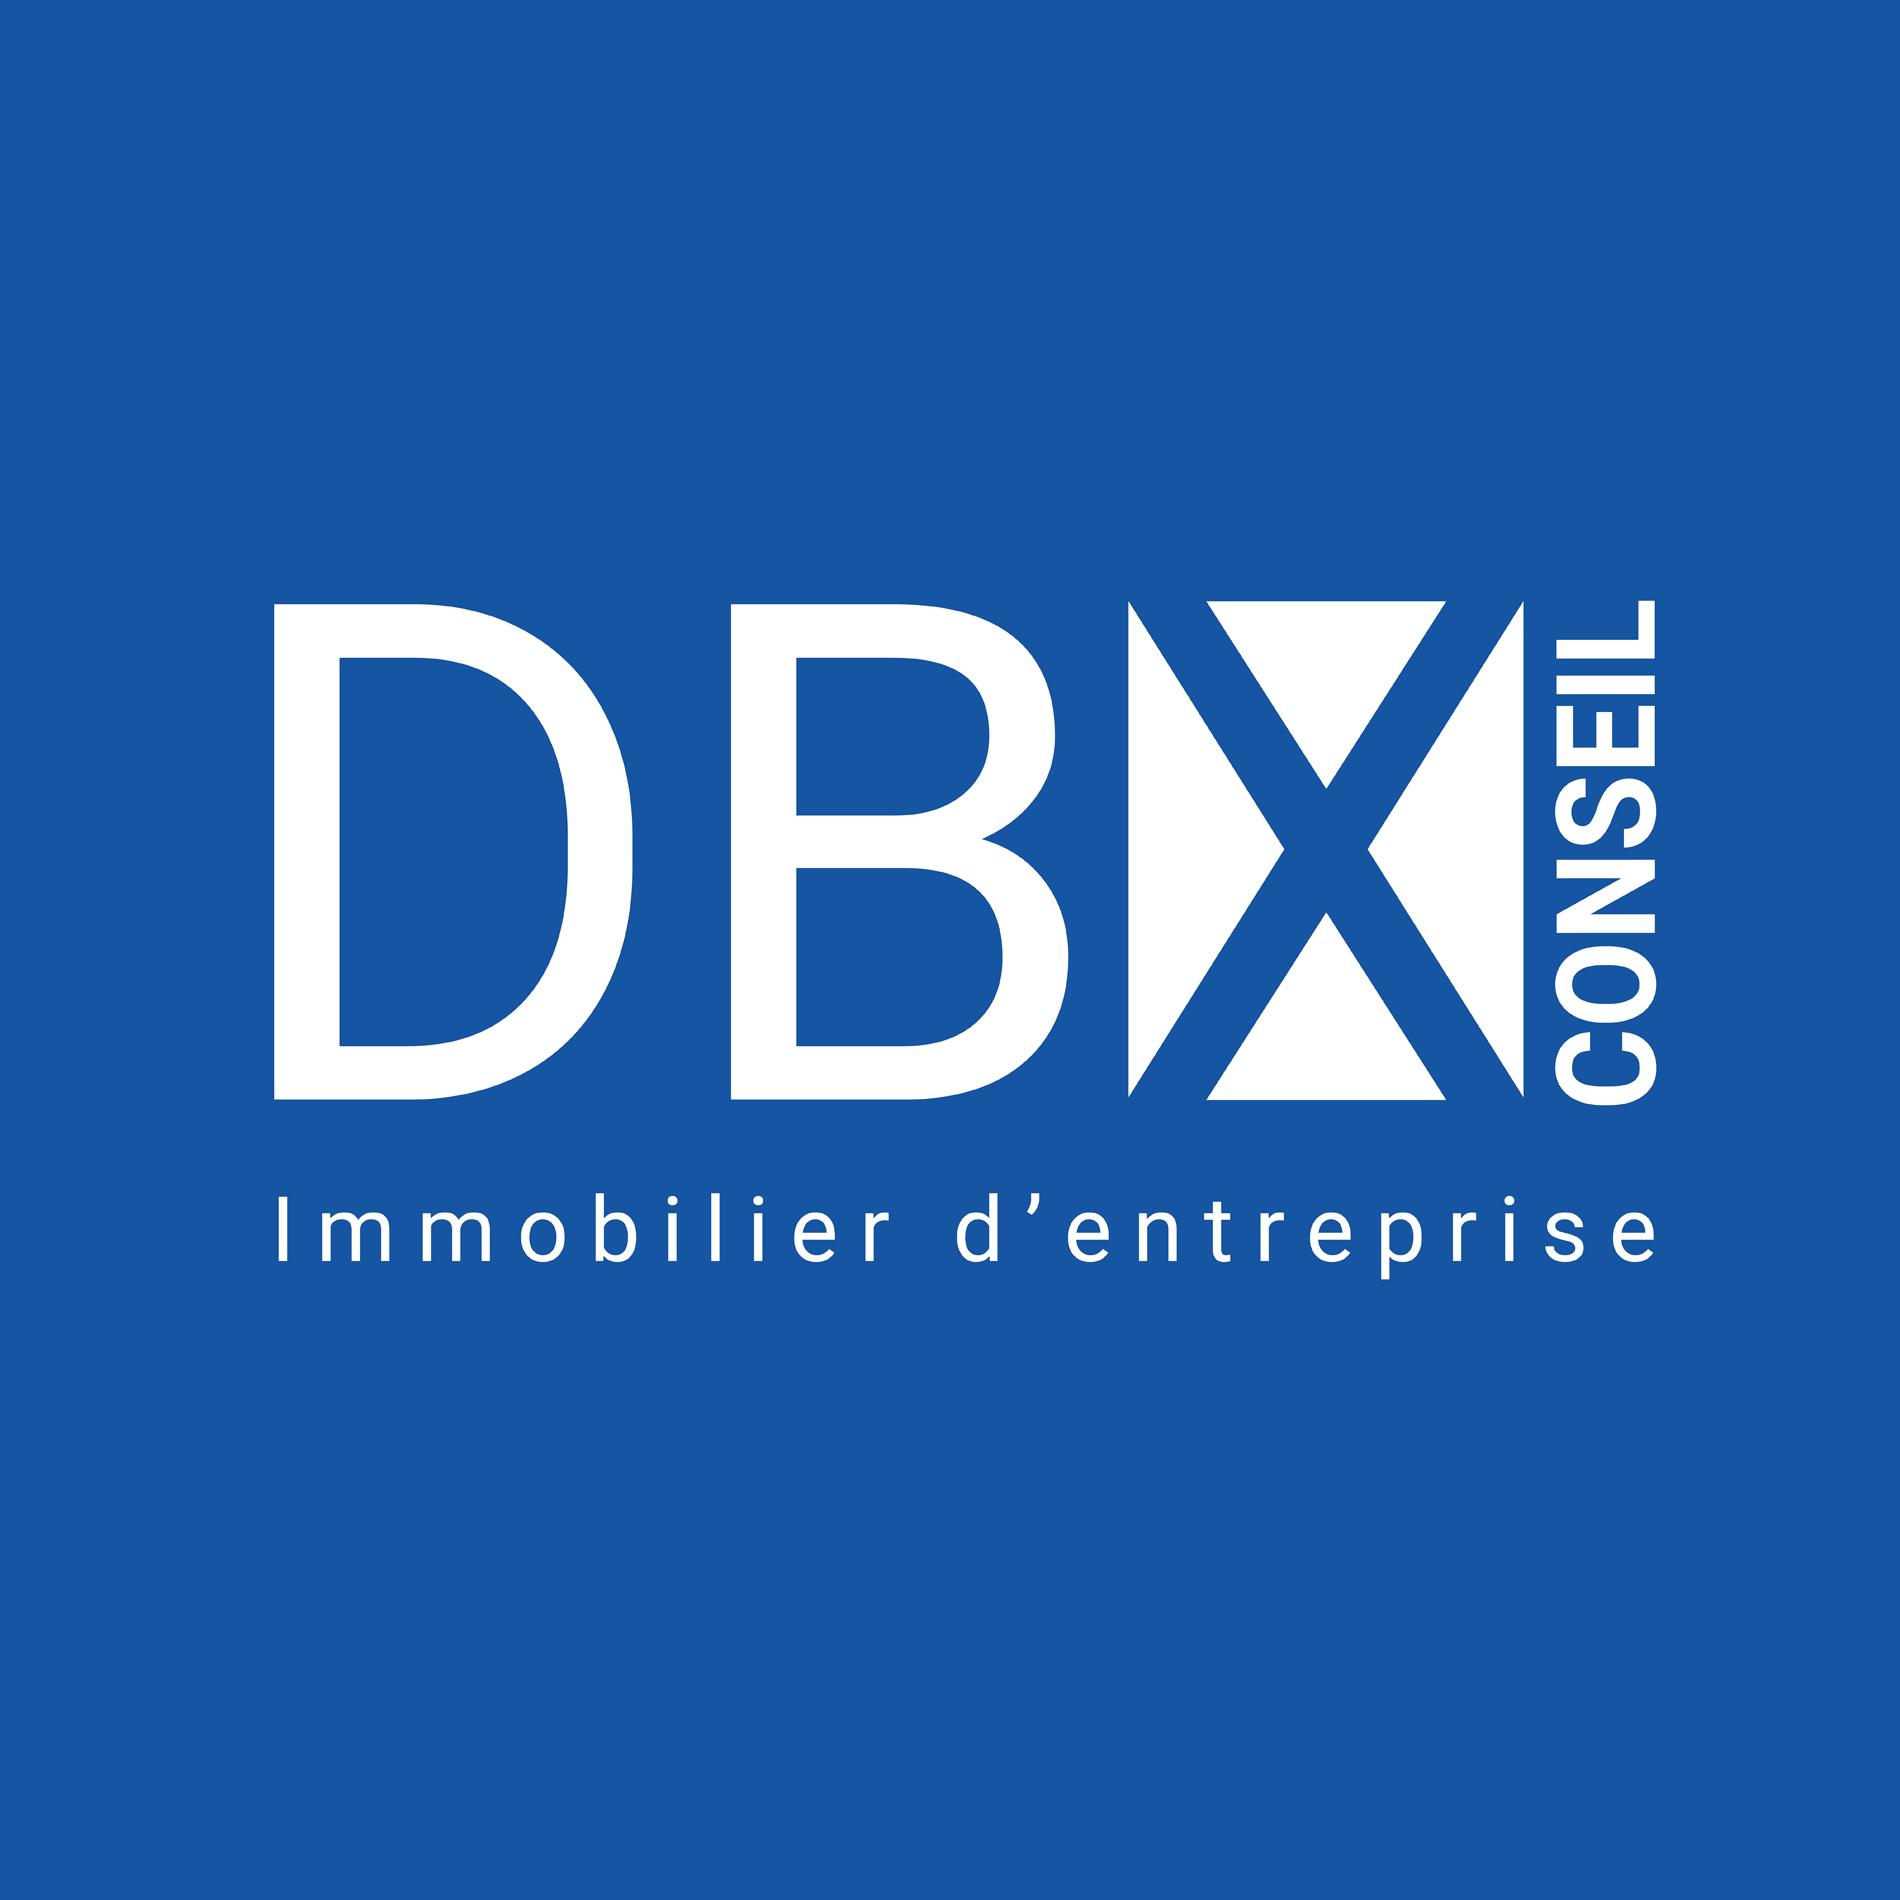 dbx conseil a 15 ans dbx conseil. Black Bedroom Furniture Sets. Home Design Ideas